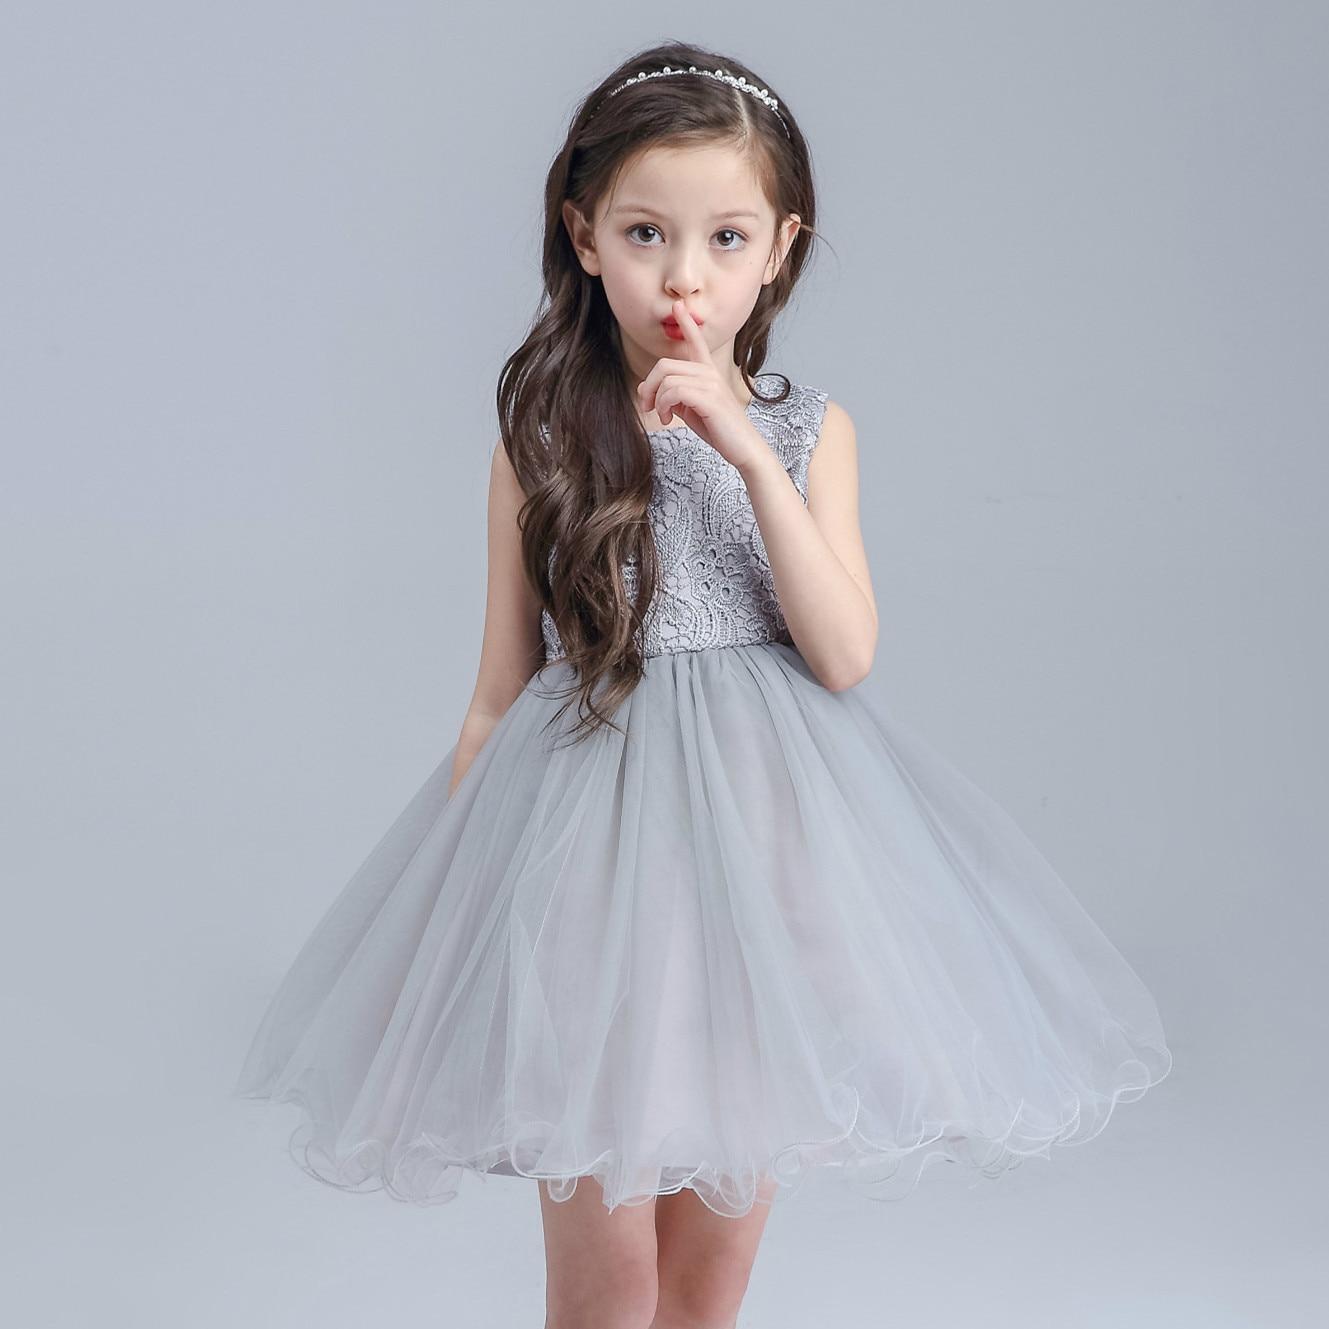 Popular Party Wear Western Dresses for Girls-Buy Cheap Party Wear ...